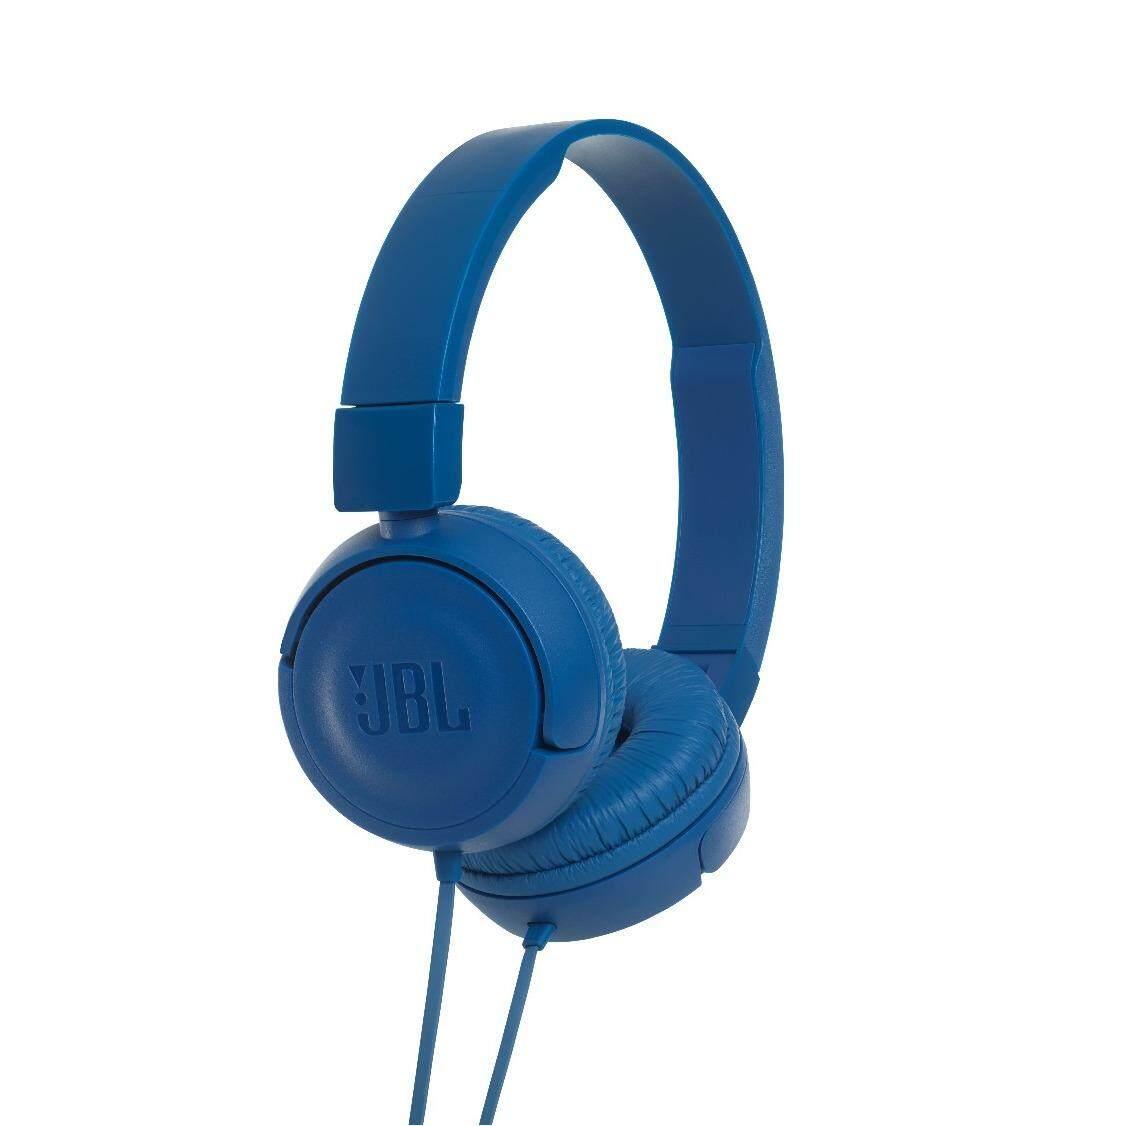 Jbl T450 On-Ear Headphone.